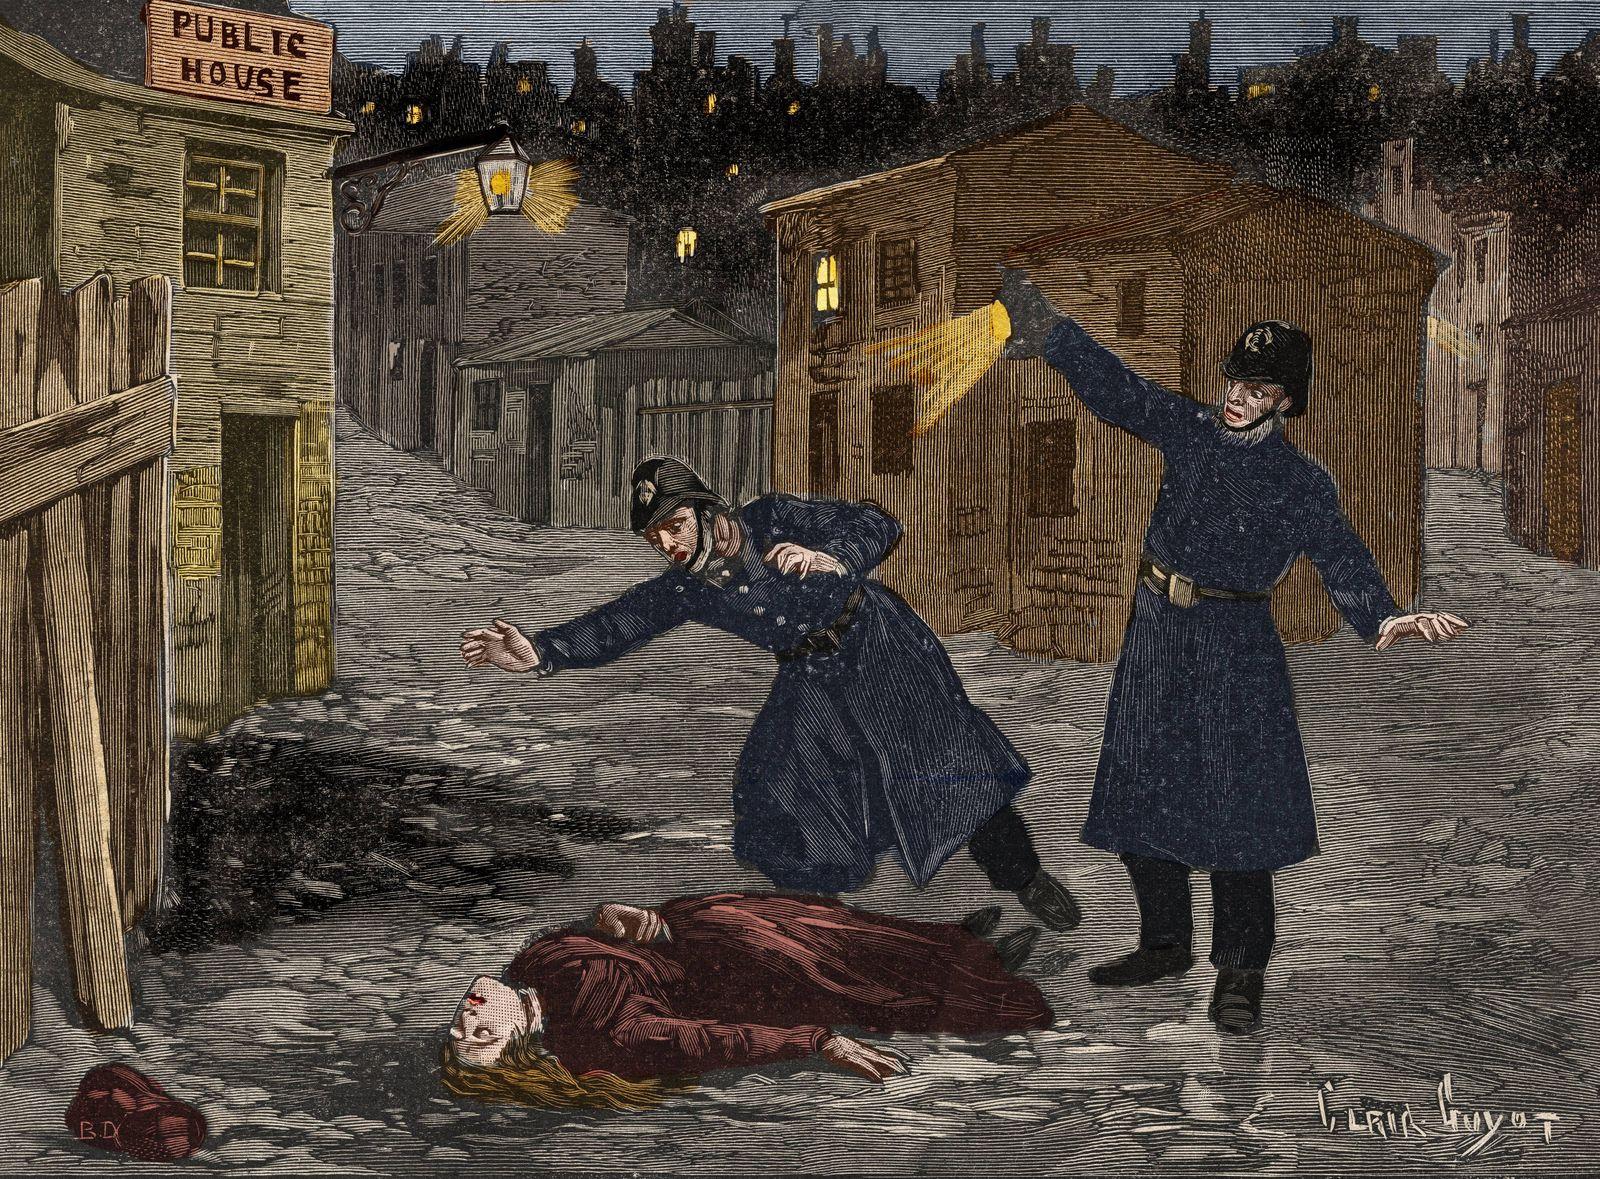 A street in Whitechapel the last crime of Jack the Ripper Crime de Whitechapel a Londres 1888 af